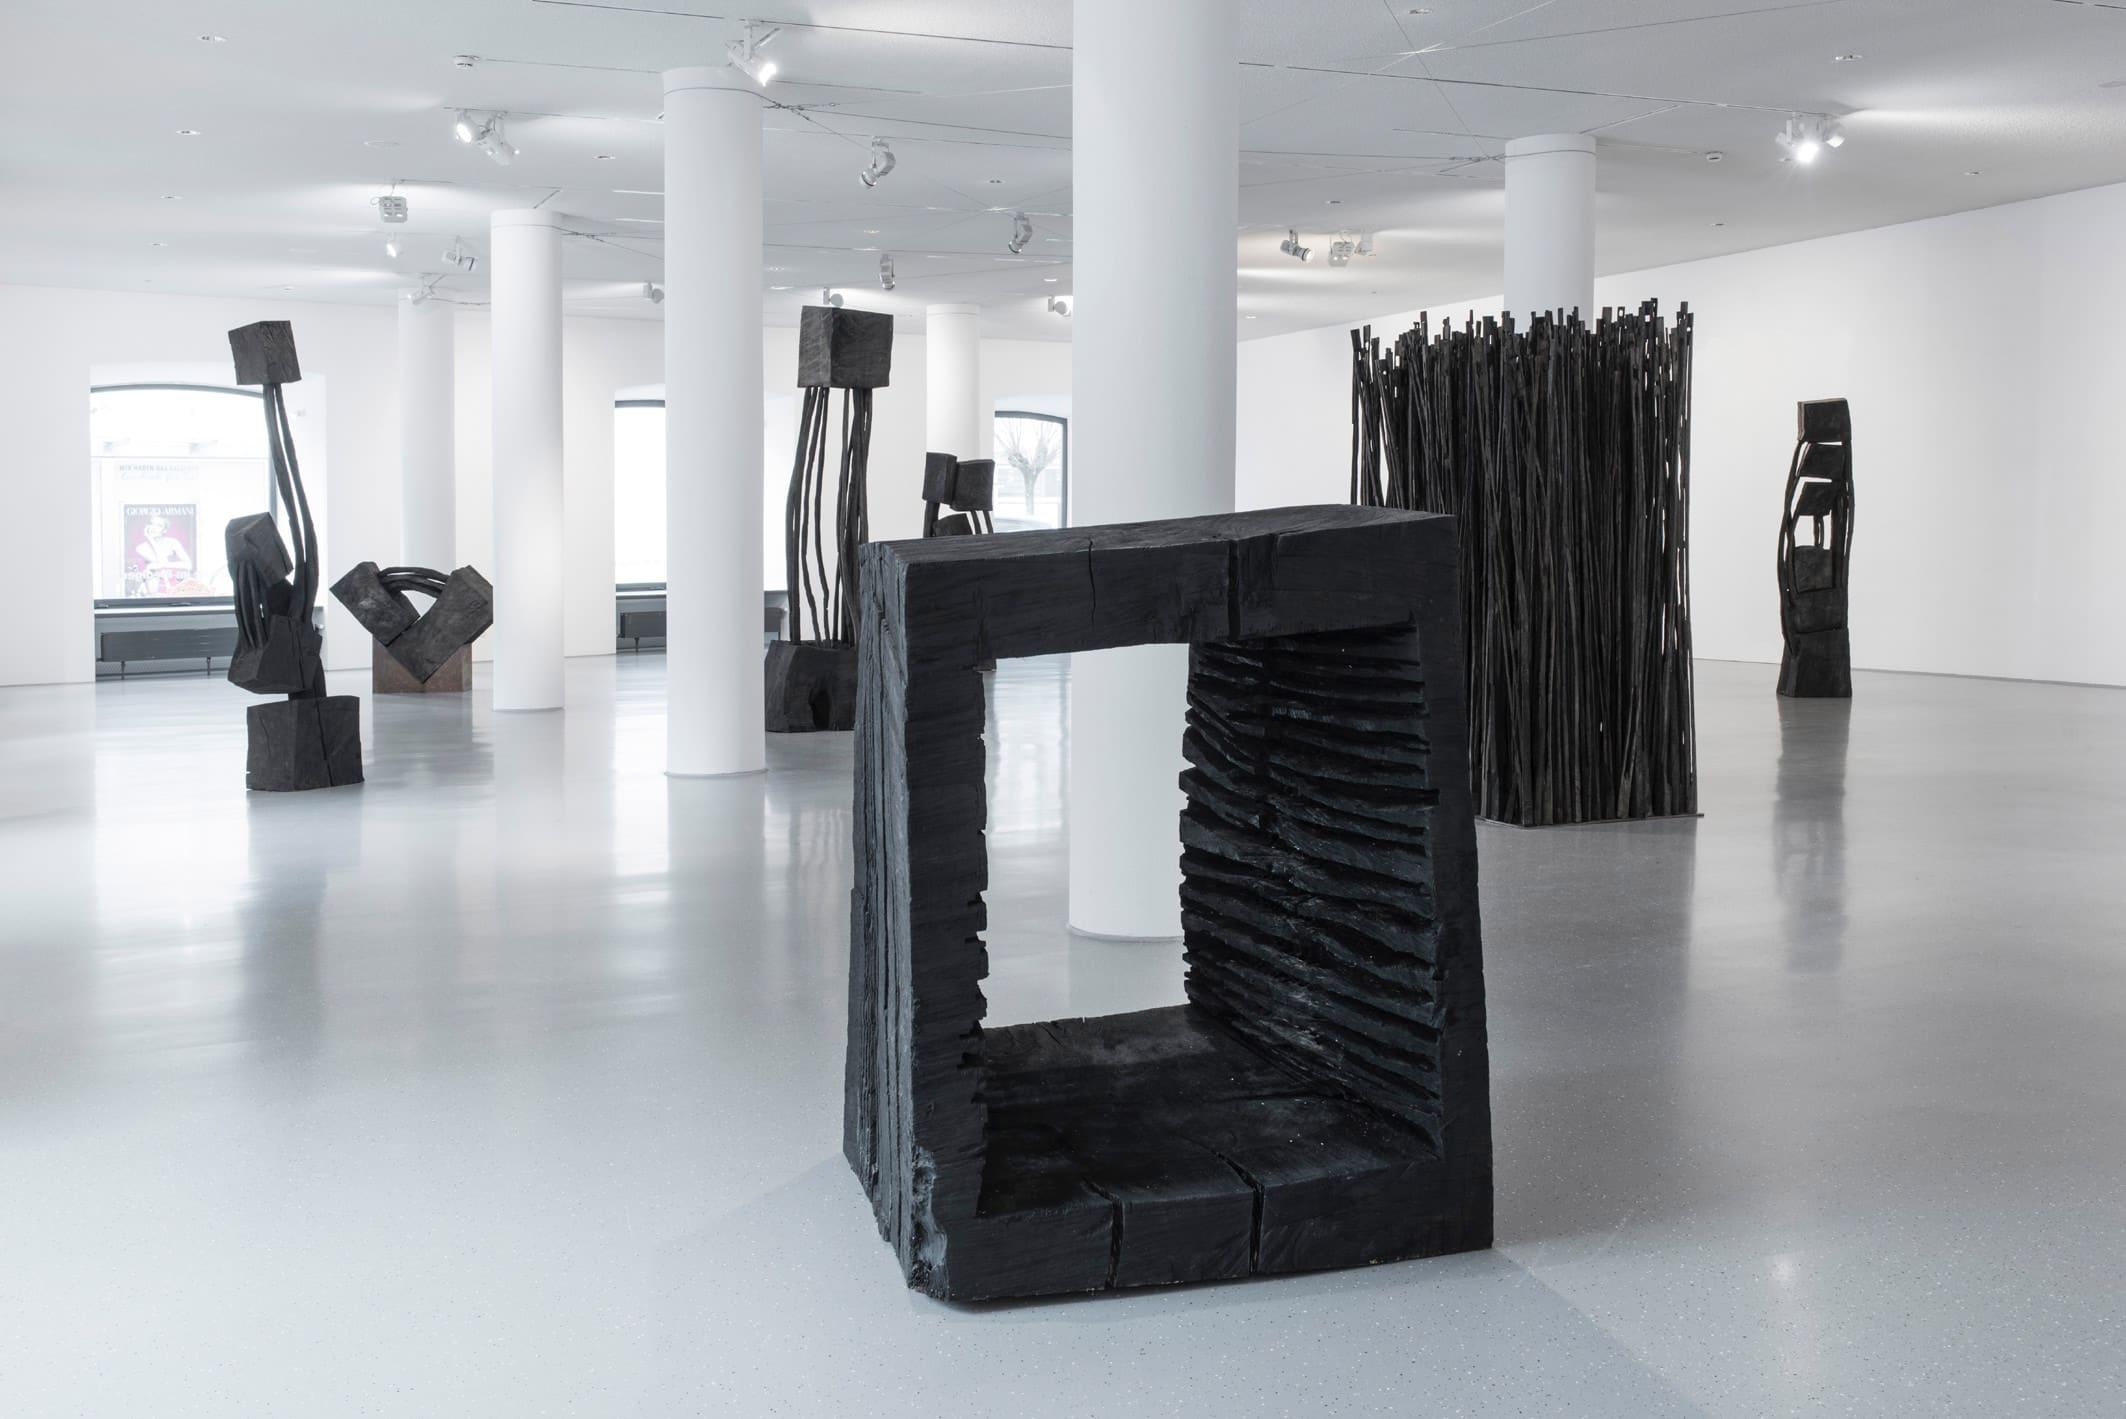 prMuseGD_aGöhringer_Ausstellungsansicht_1